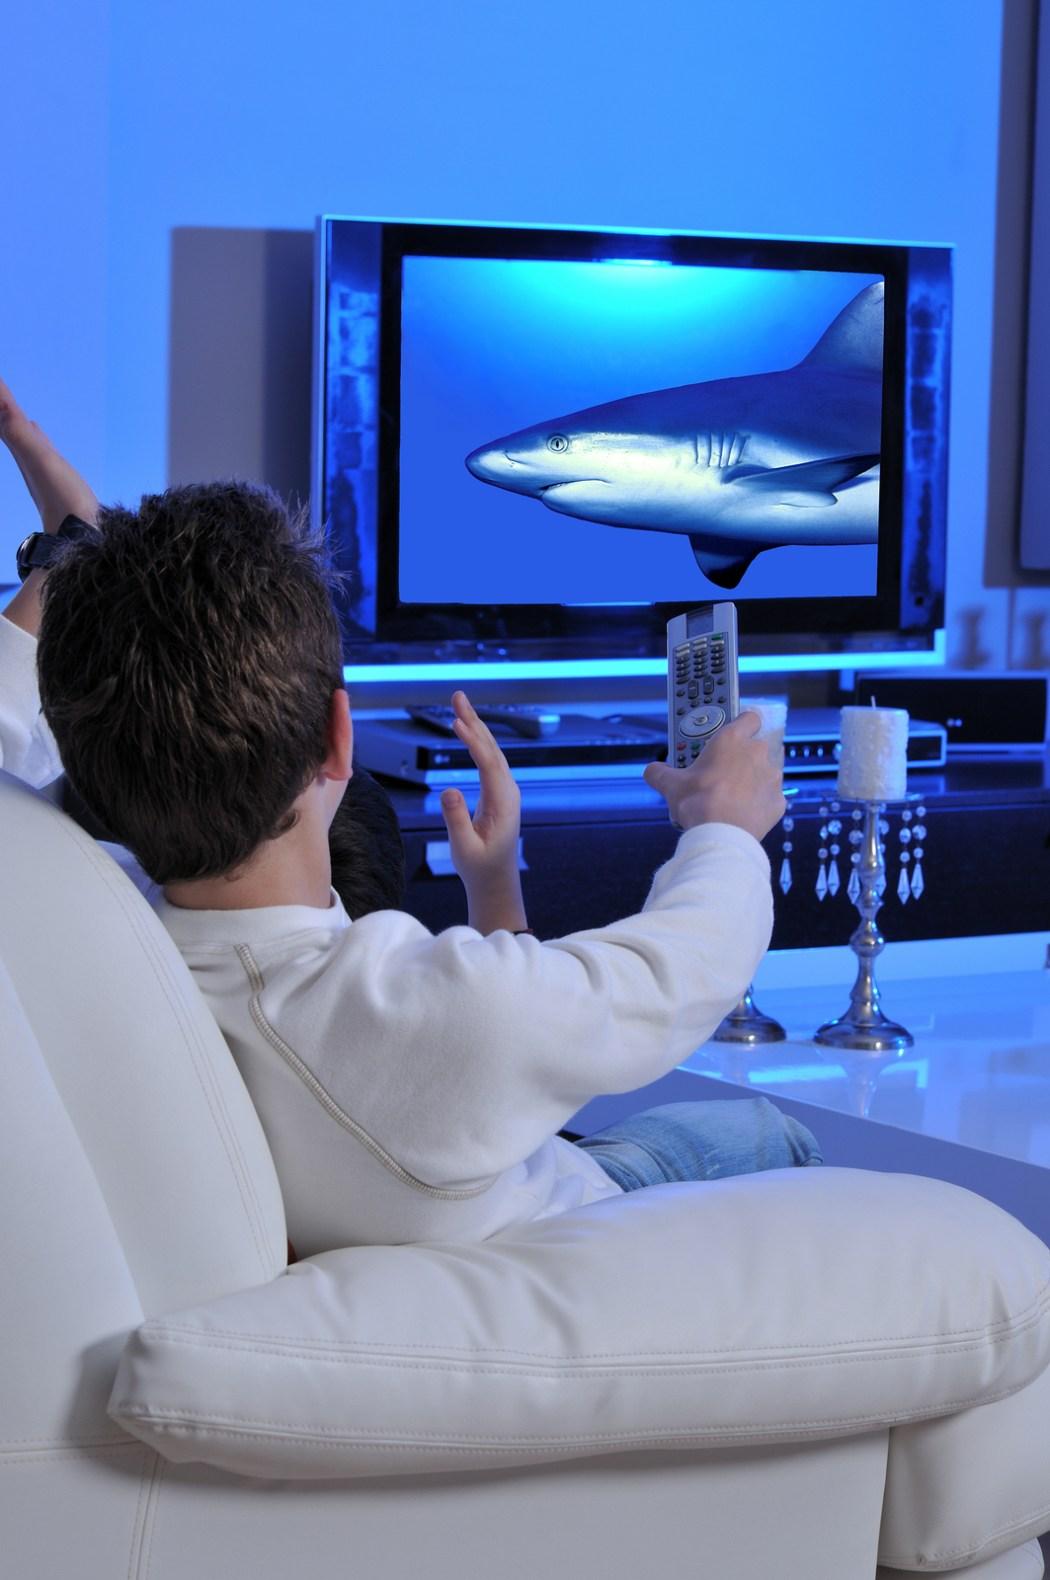 bigstock-Two-boys-watching-underwater-d-19473356